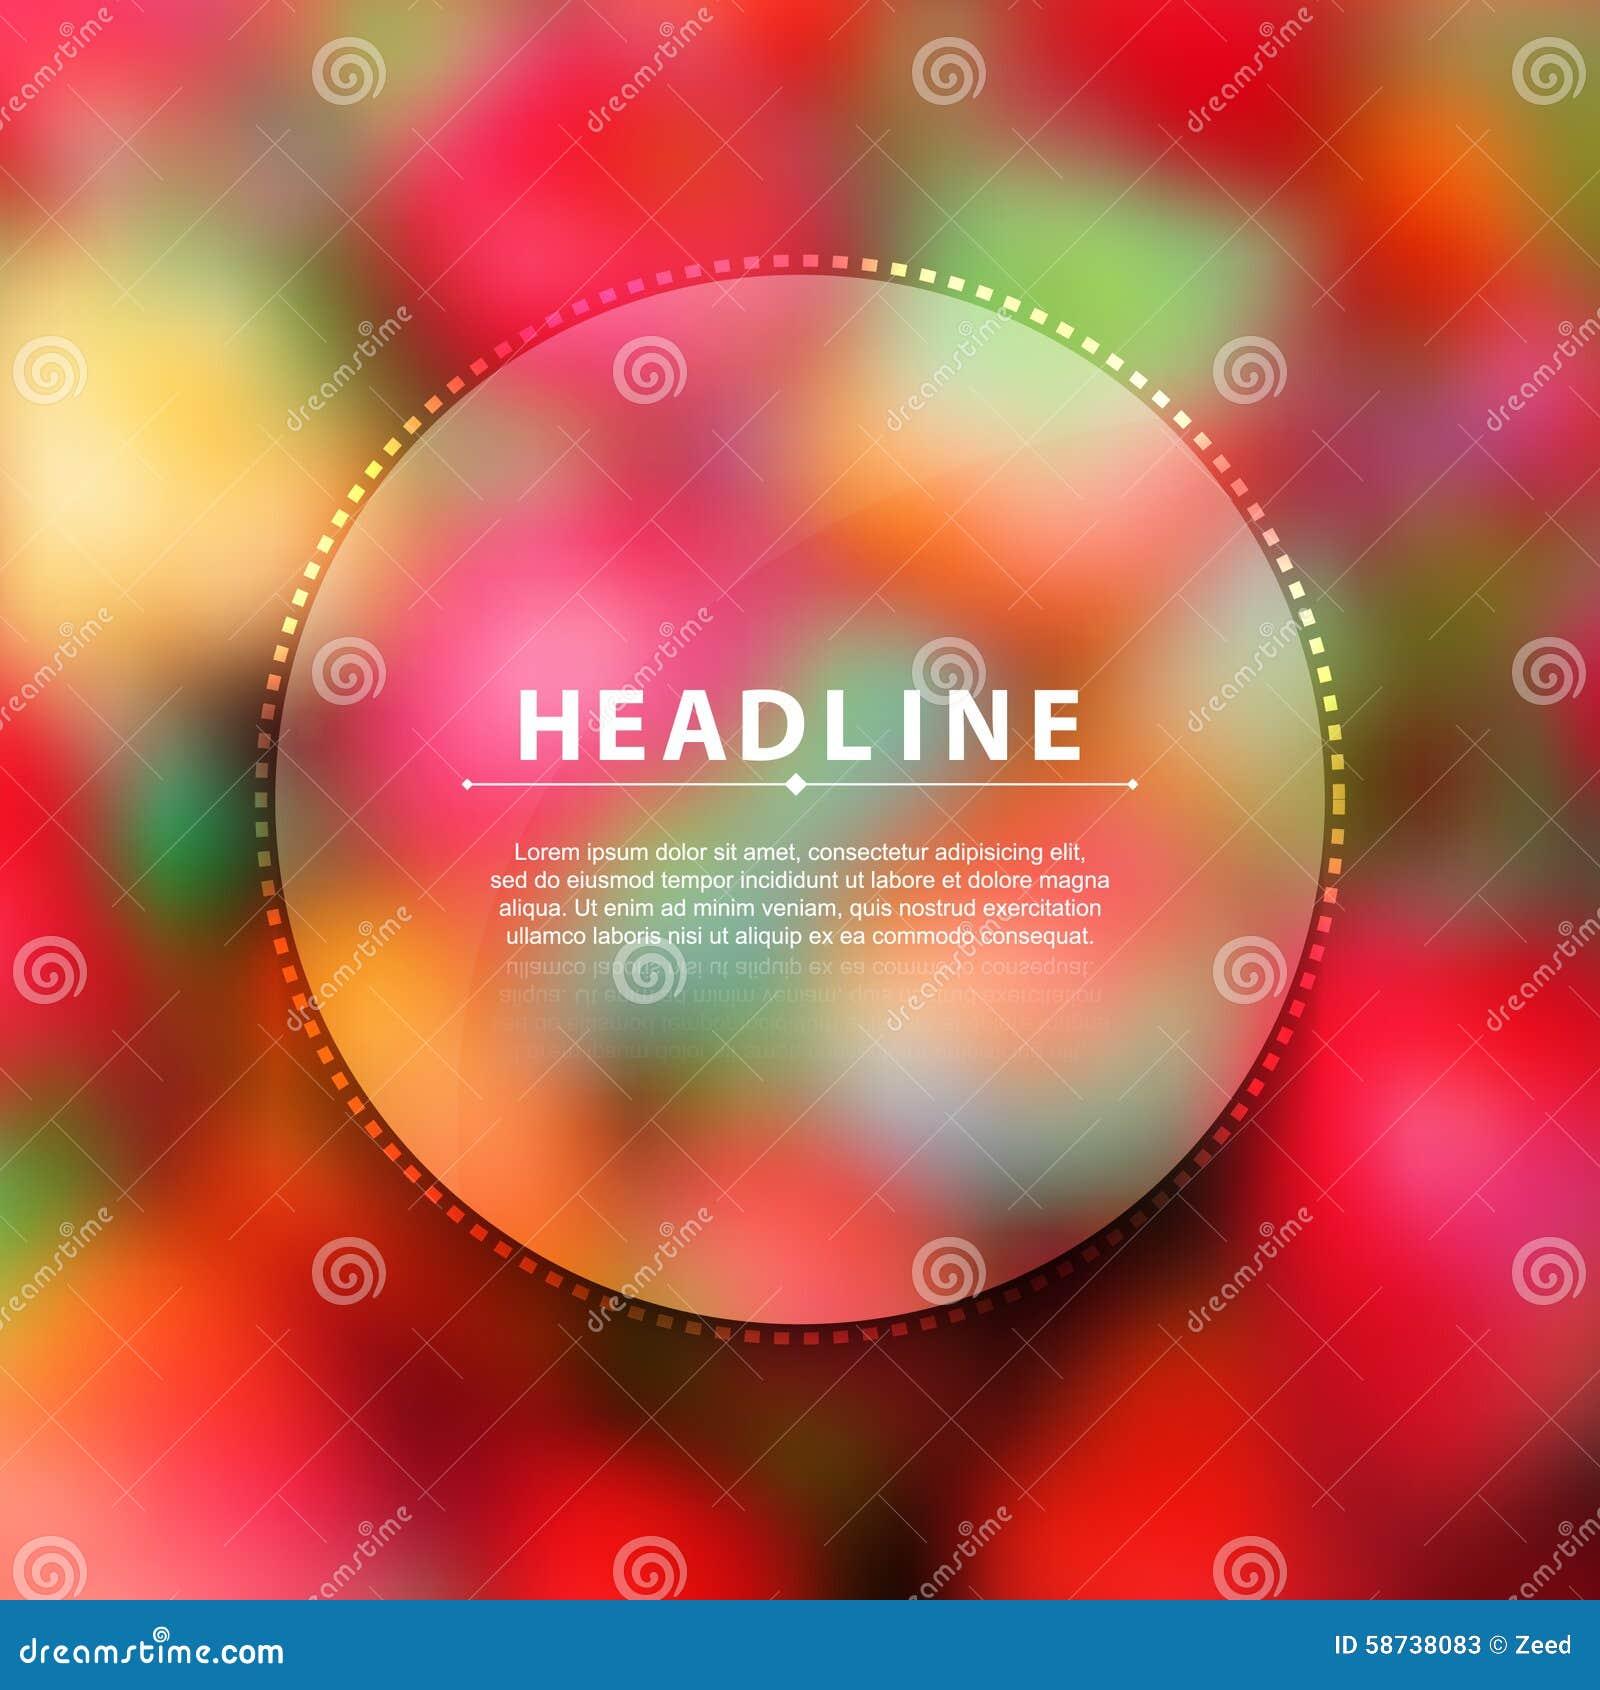 Simple Blurred Photo Realistic Background Blank Headline Brochure ...